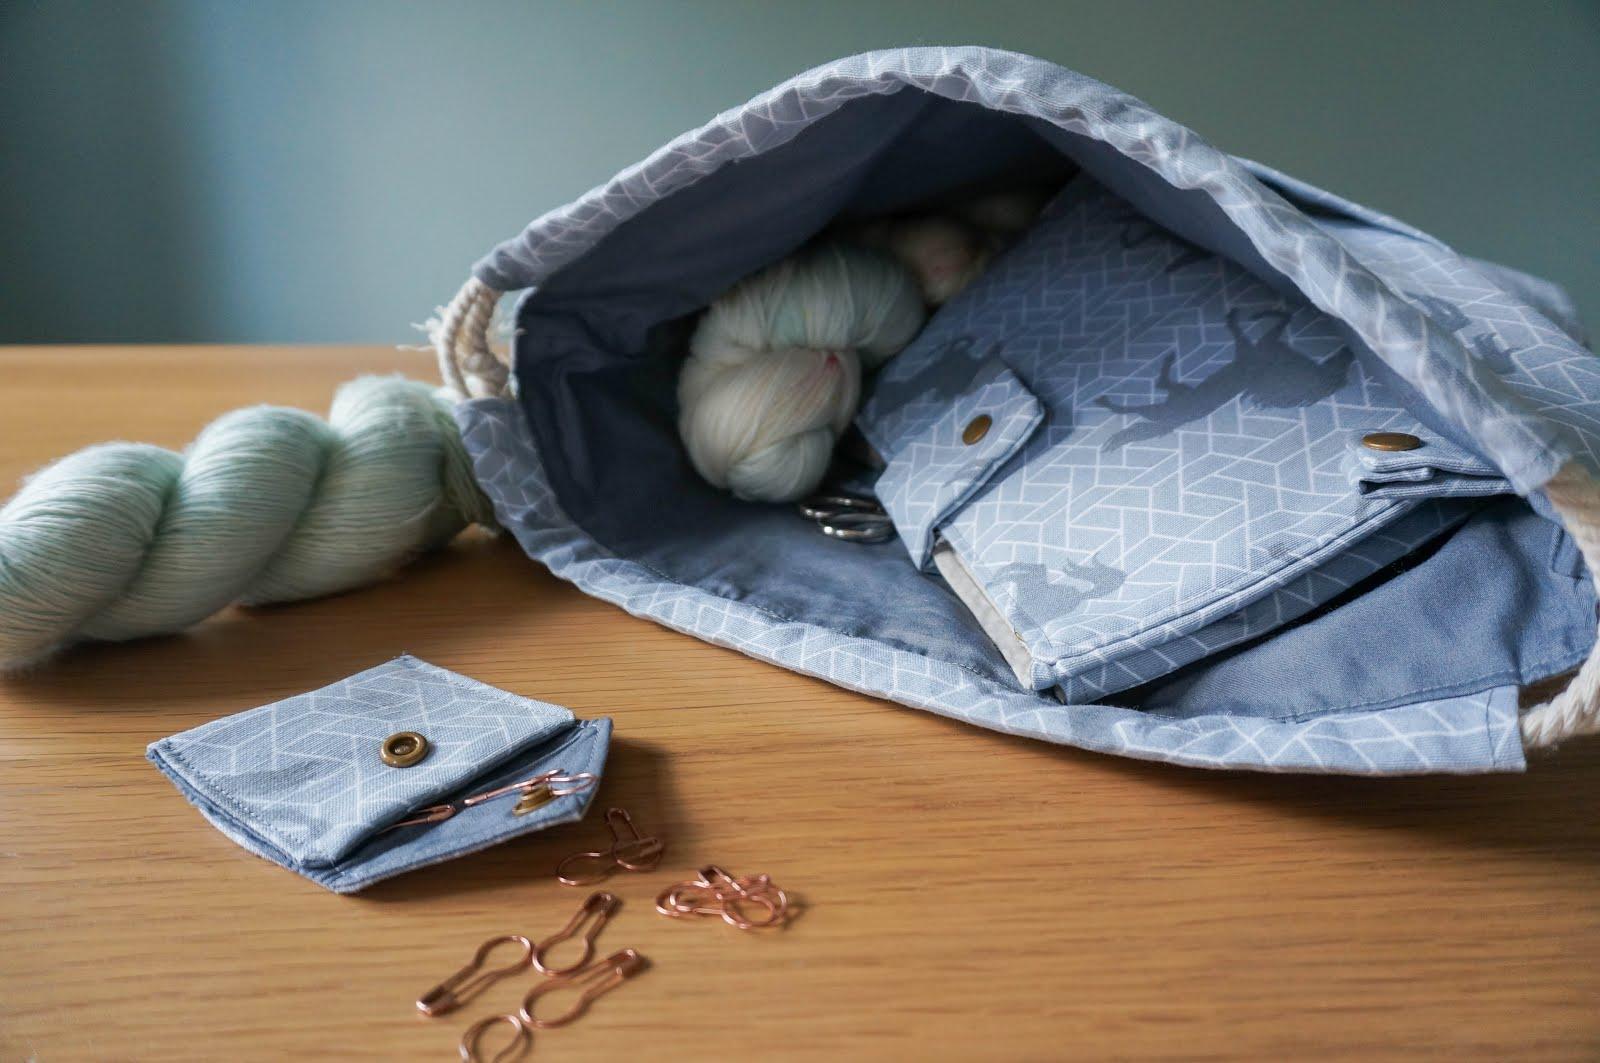 Sew your own drawstring bag